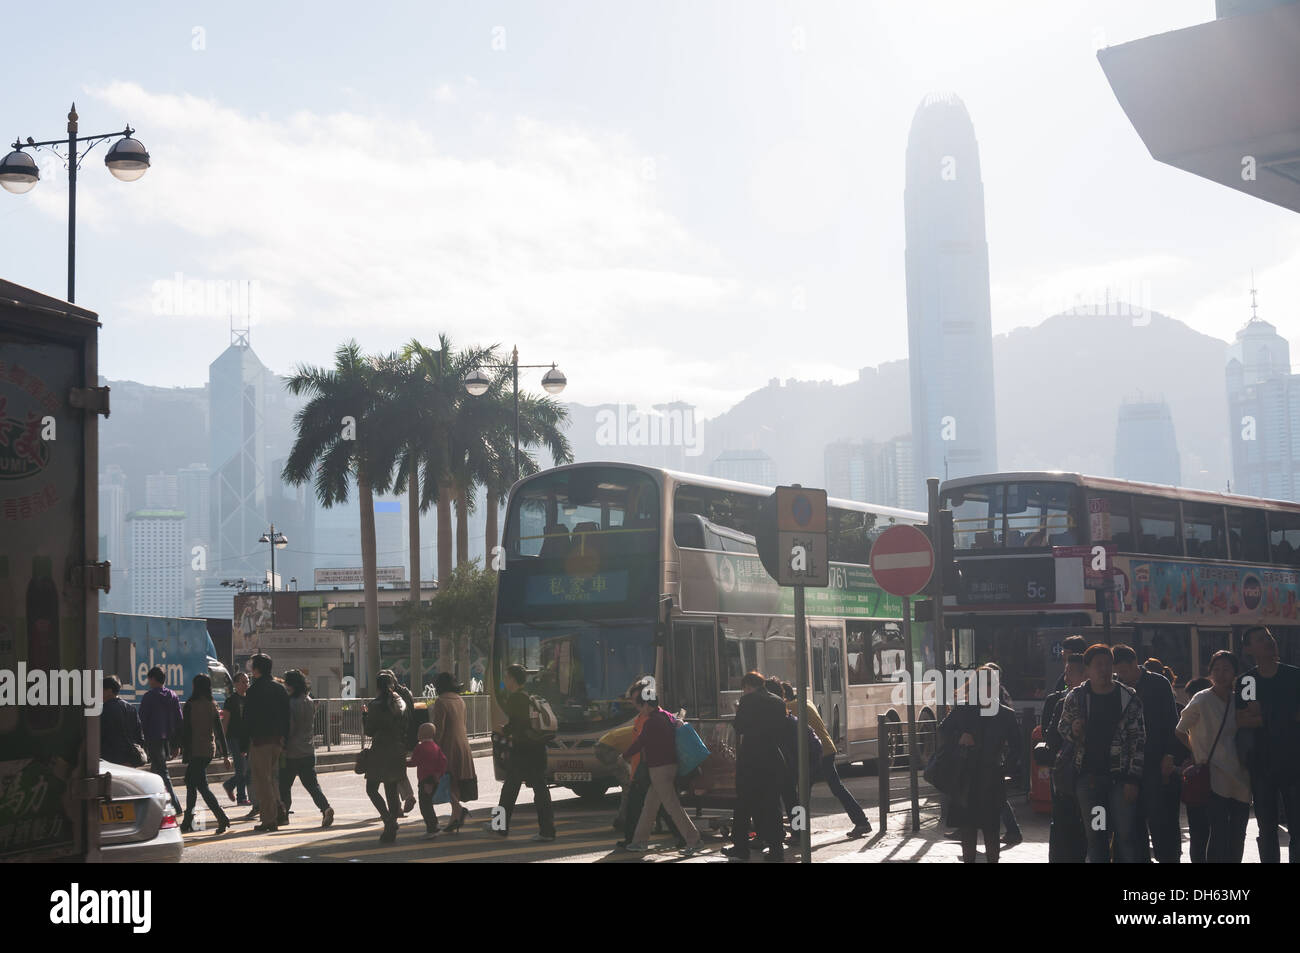 Crosswalk in Kowloon, Hong Kong. - Stock Image